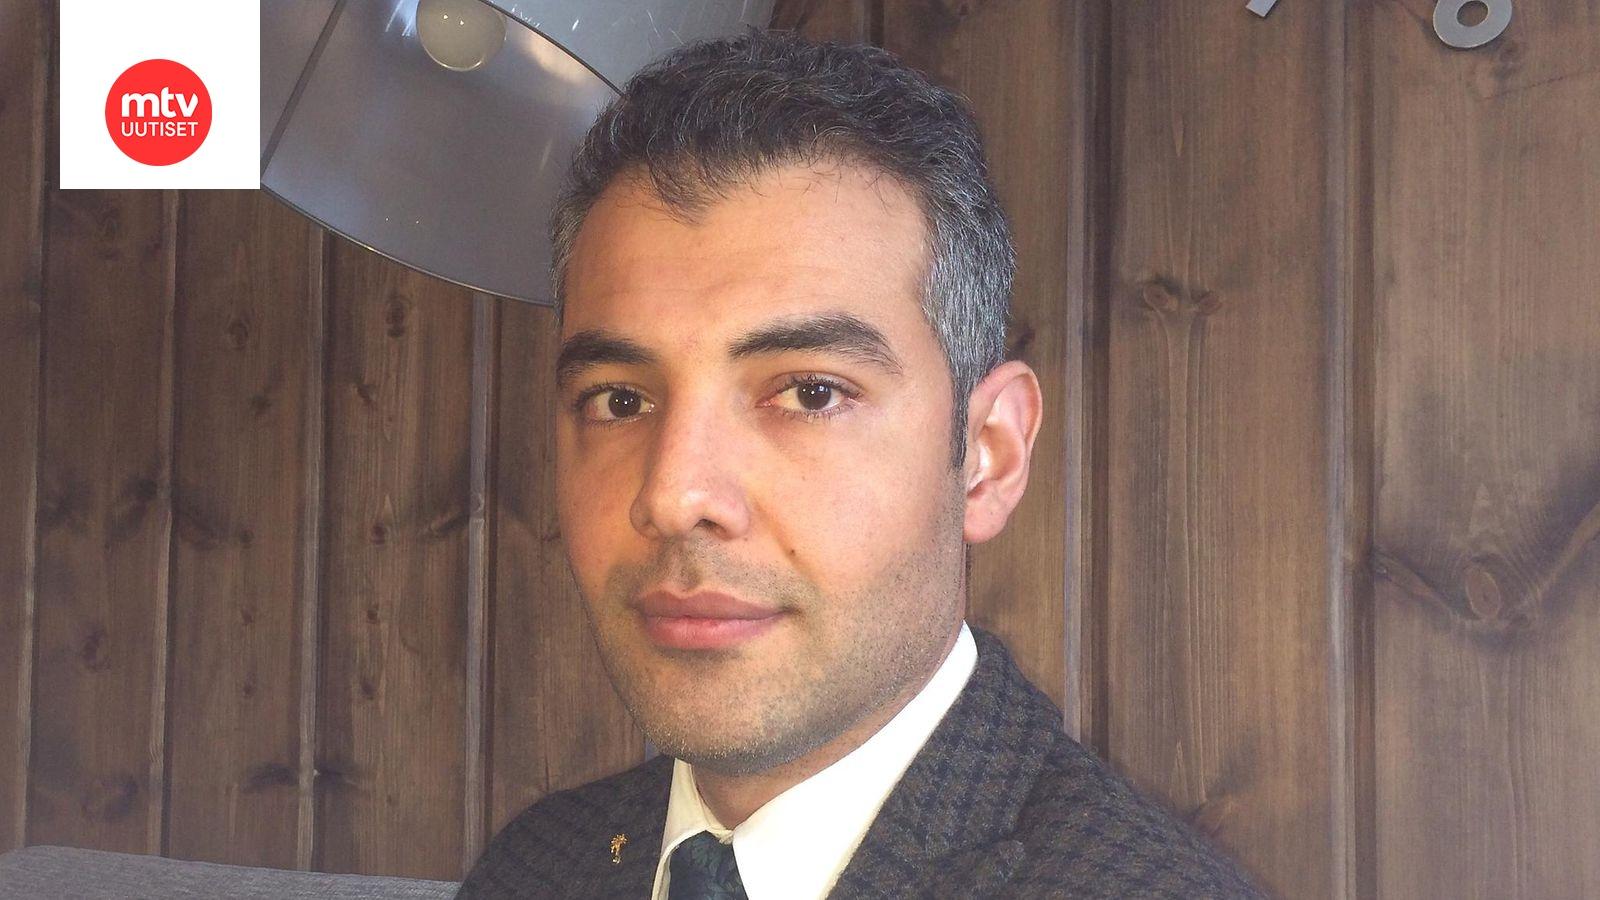 Hussein Al-Taee Facebook